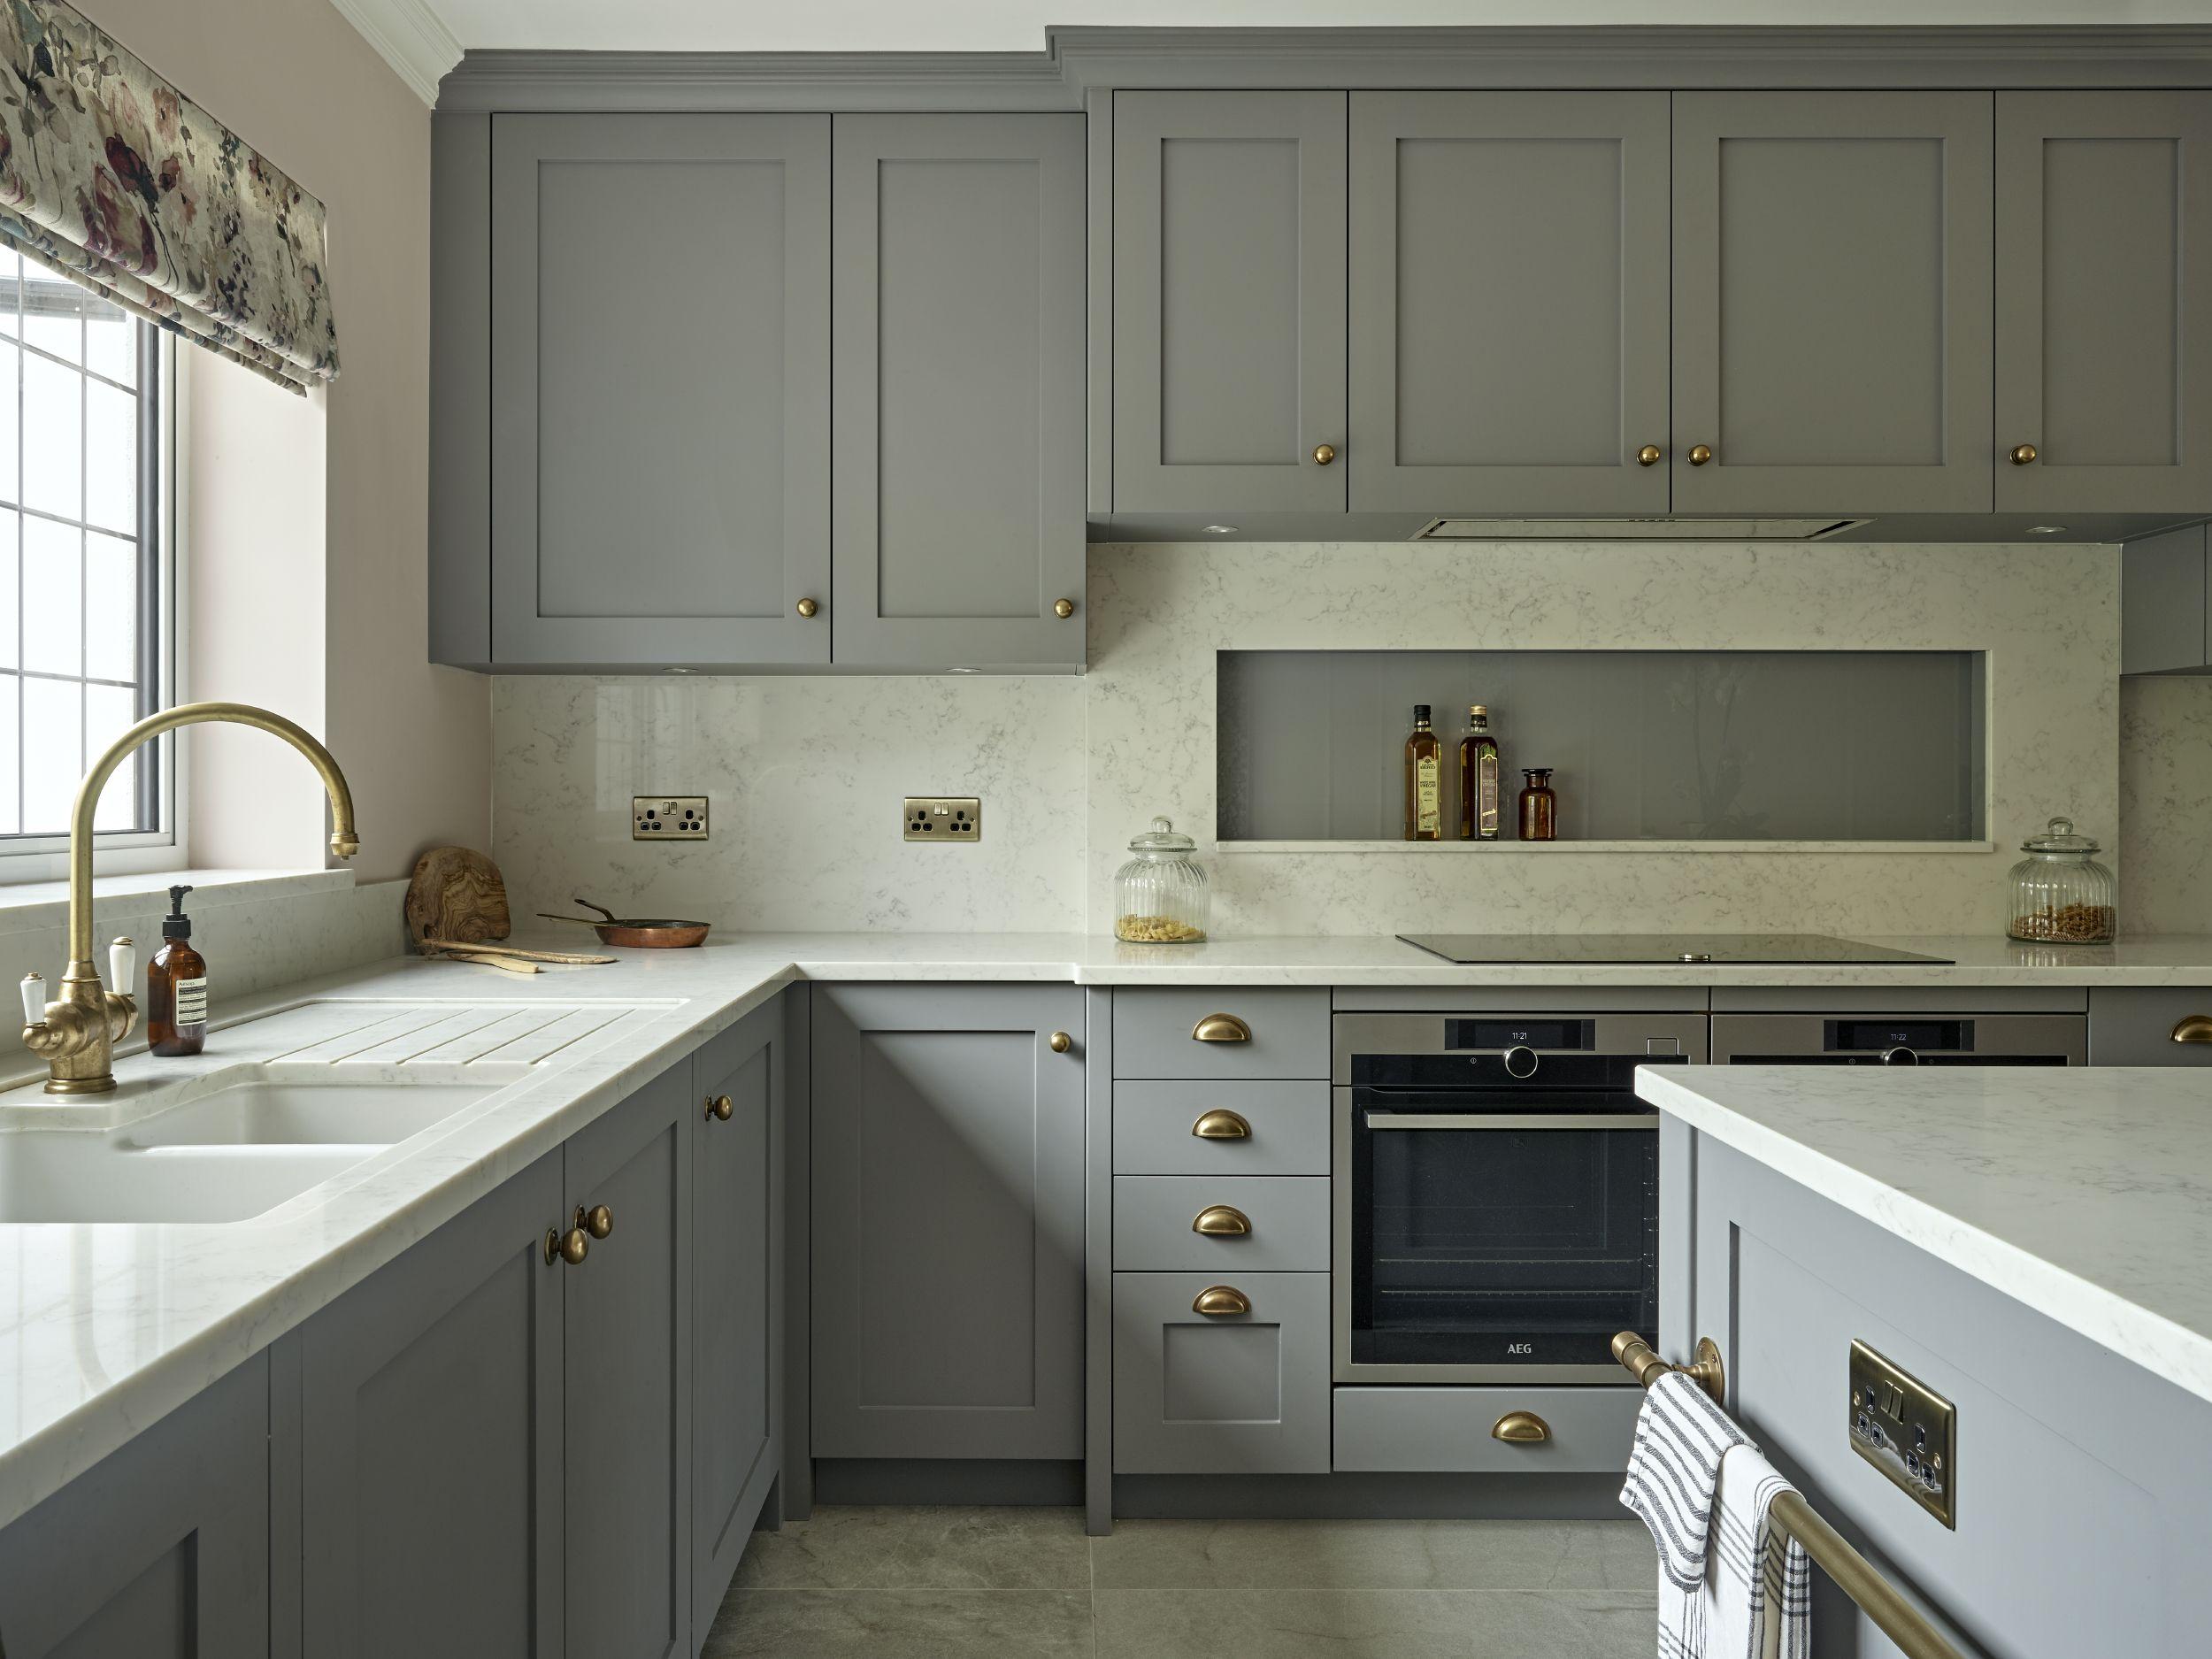 Kingswood Kitchen, Surrey Bespoke Country Cottage